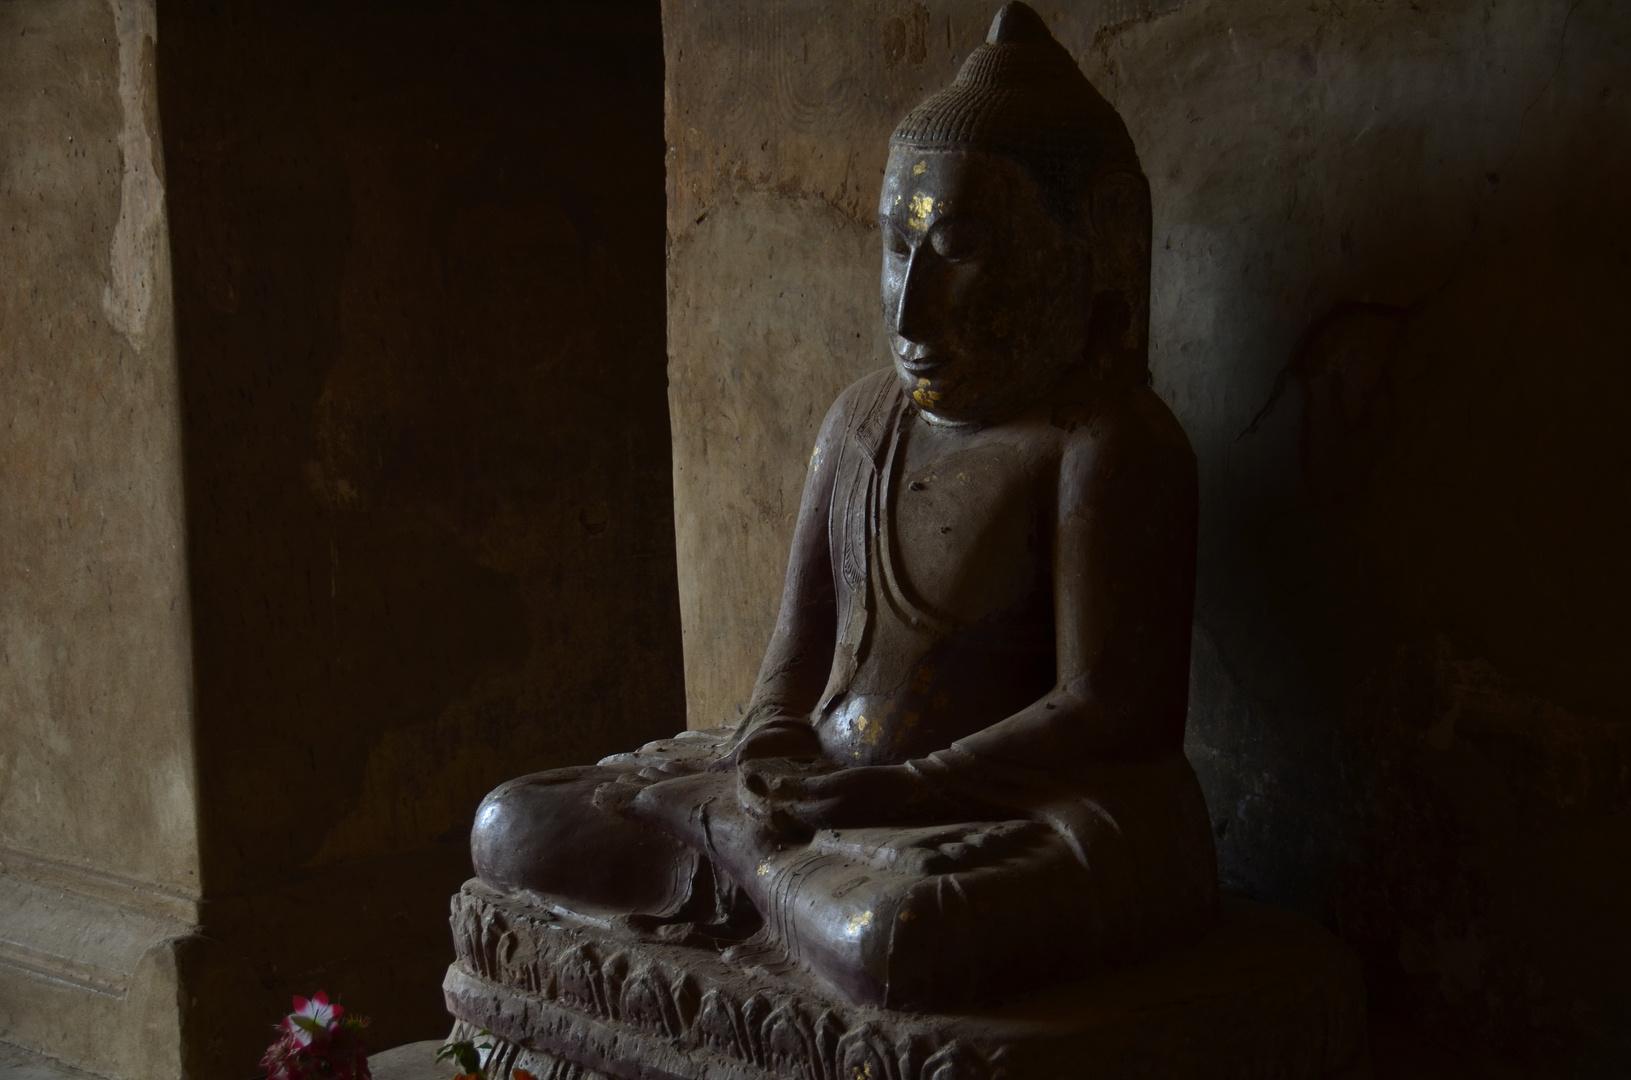 Buddhastatue in einem Tempel in Bagan, Myanmar